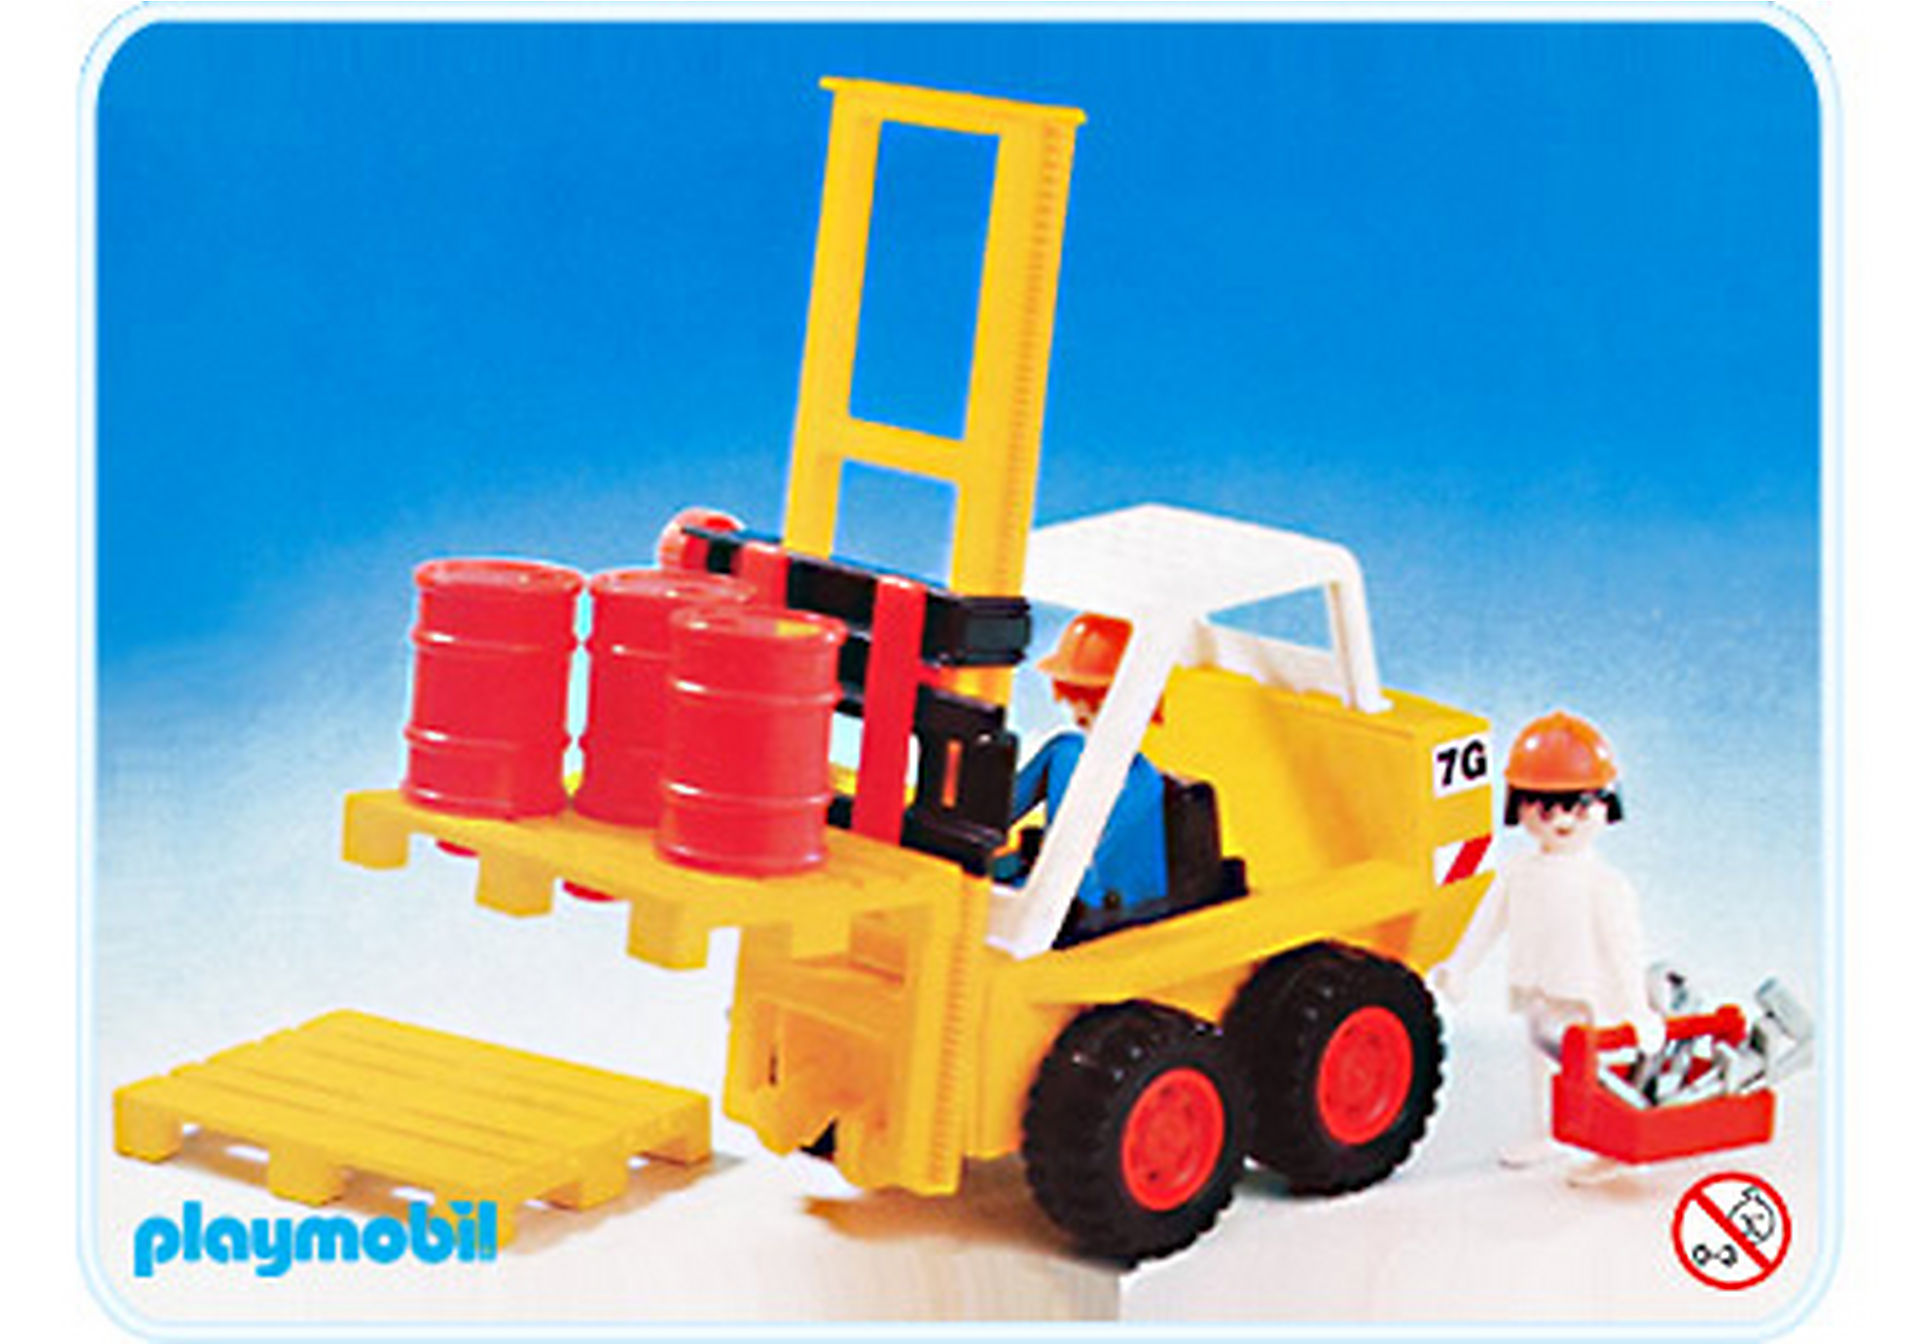 http://media.playmobil.com/i/playmobil/3506-A_product_detail/Gabelstapler